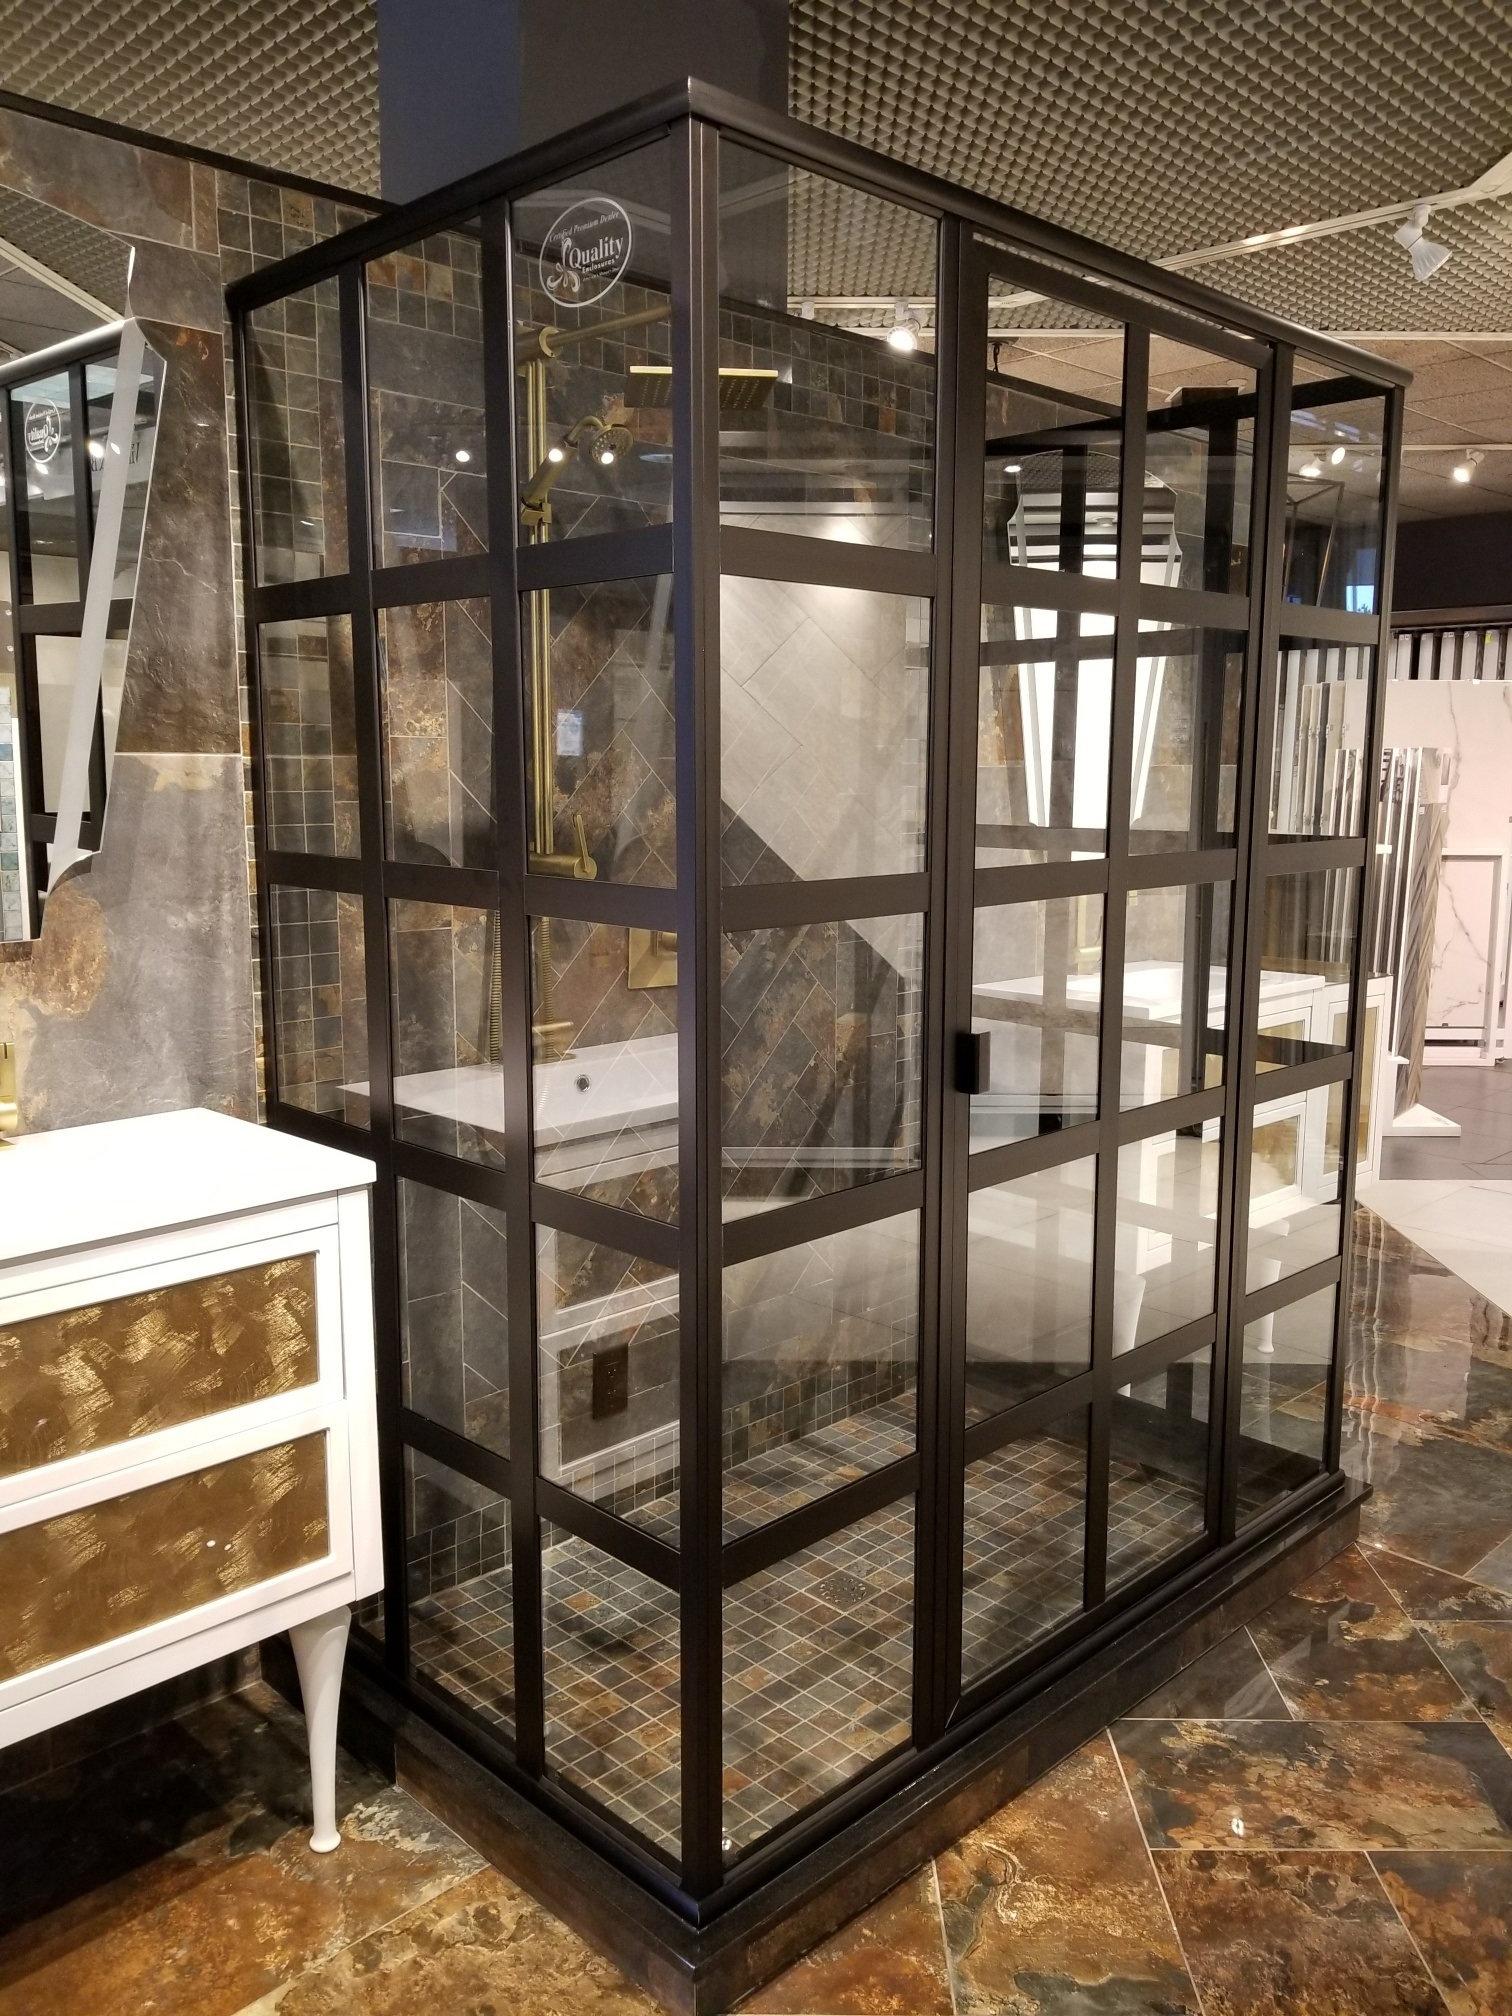 Quality Enclosures, Inc. image | Quality Enclosures, Inc.